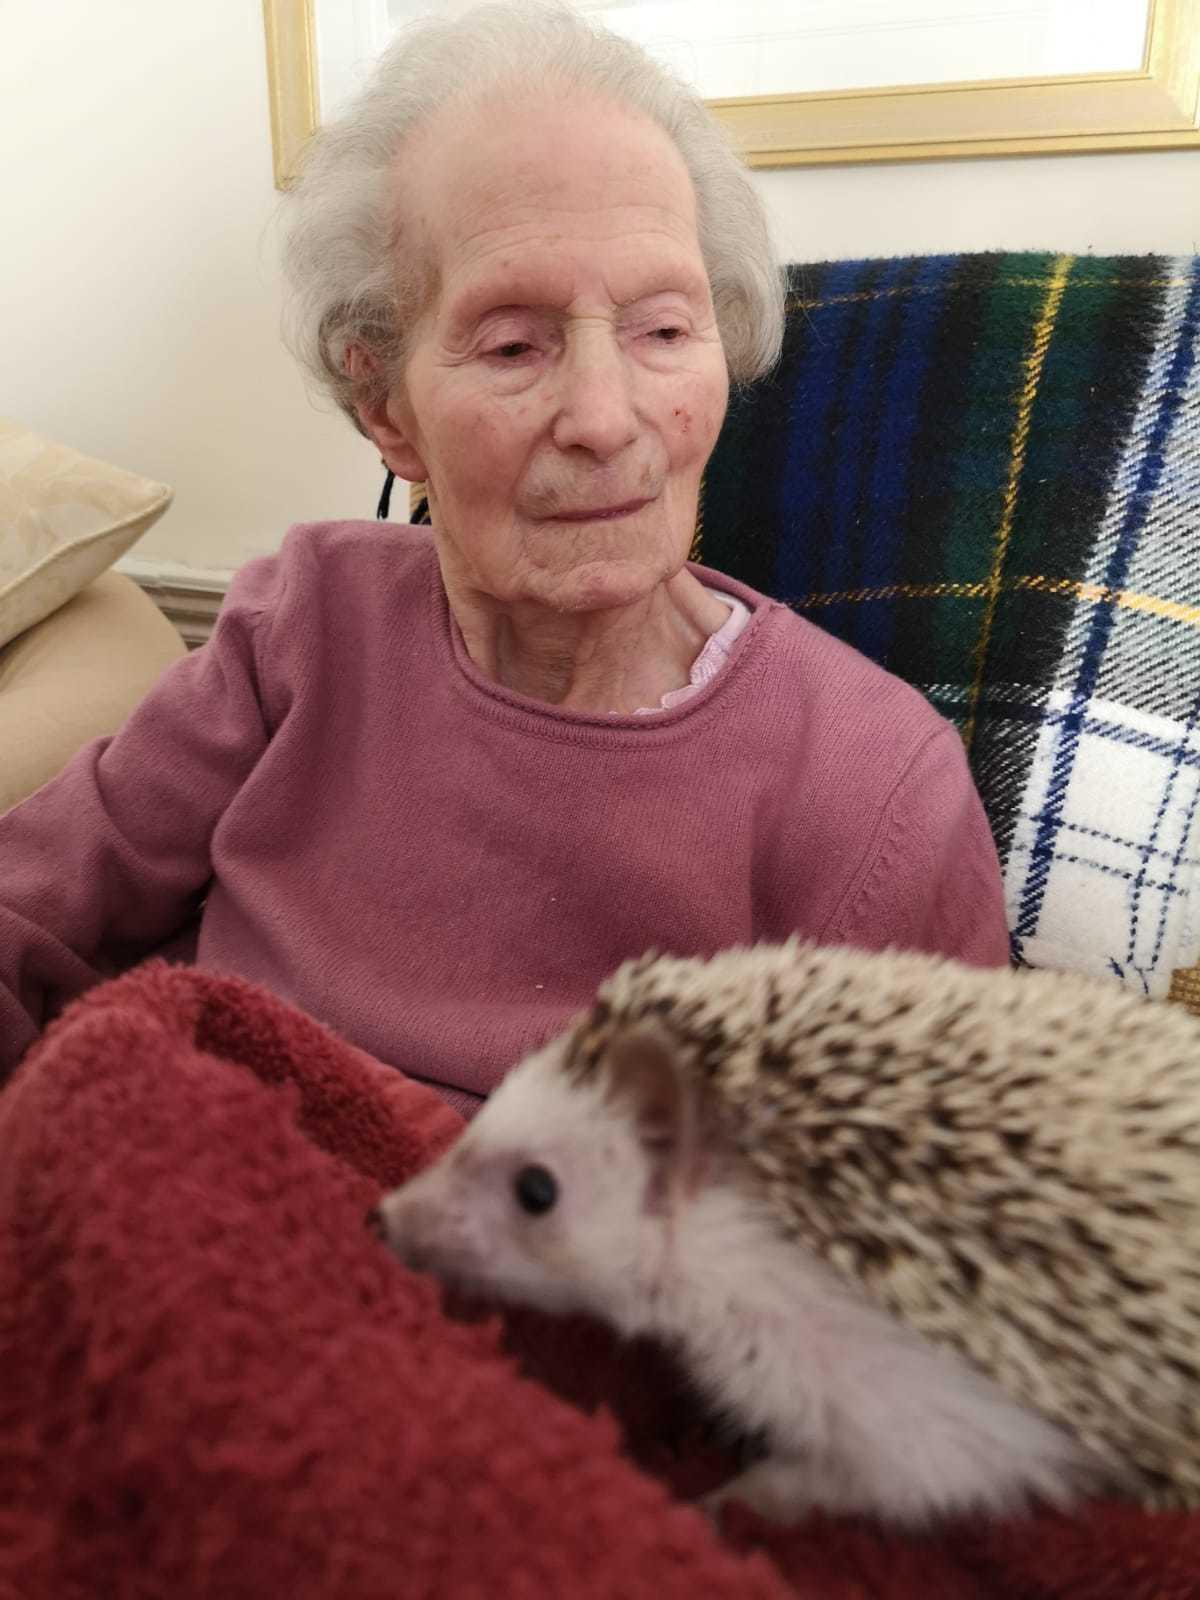 Meeting a hedgehog